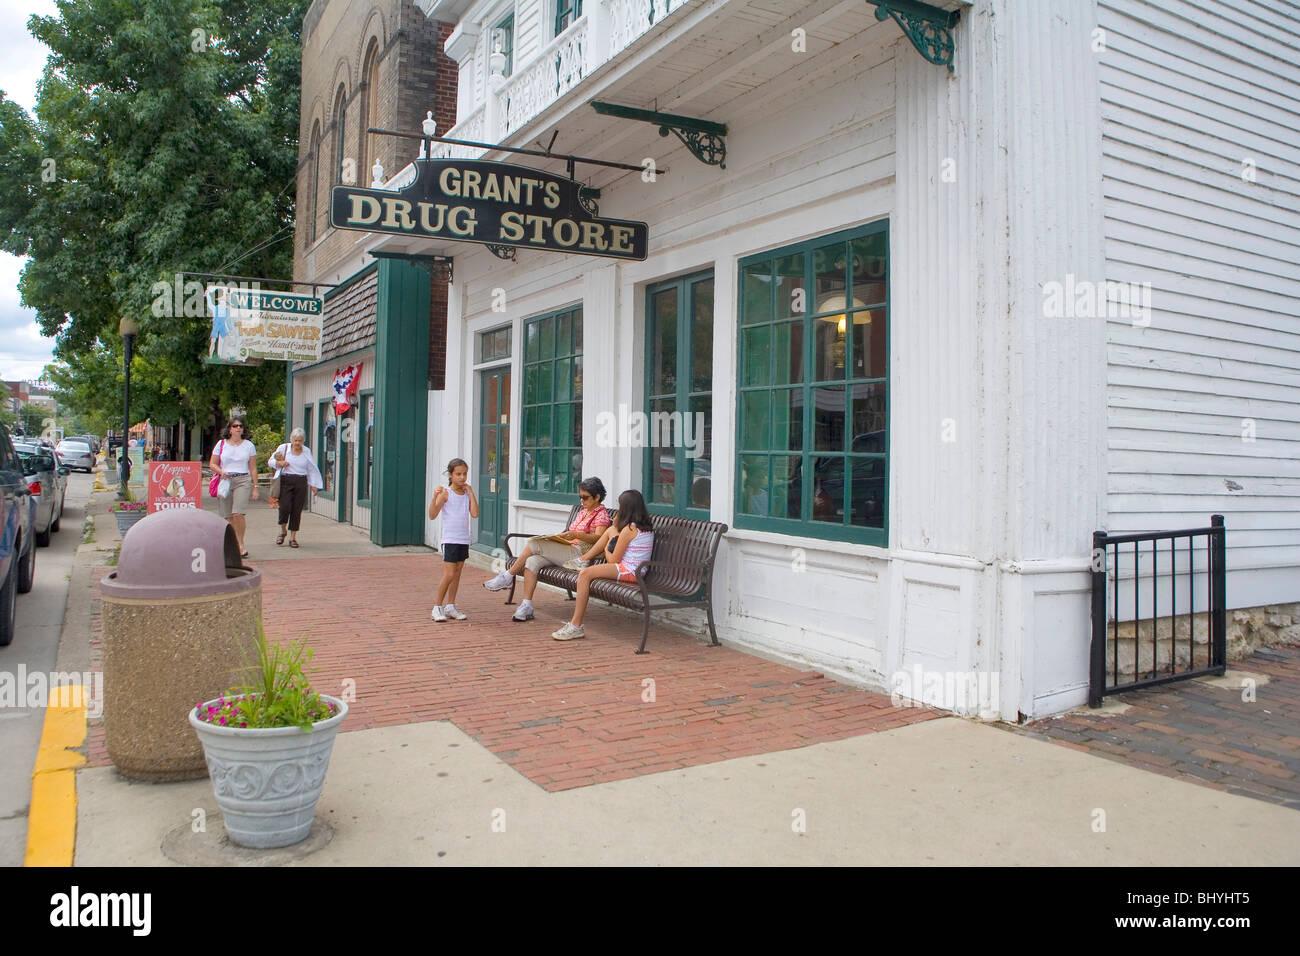 Grant's Drug Store - Casa de la Pilastra Imagen De Stock